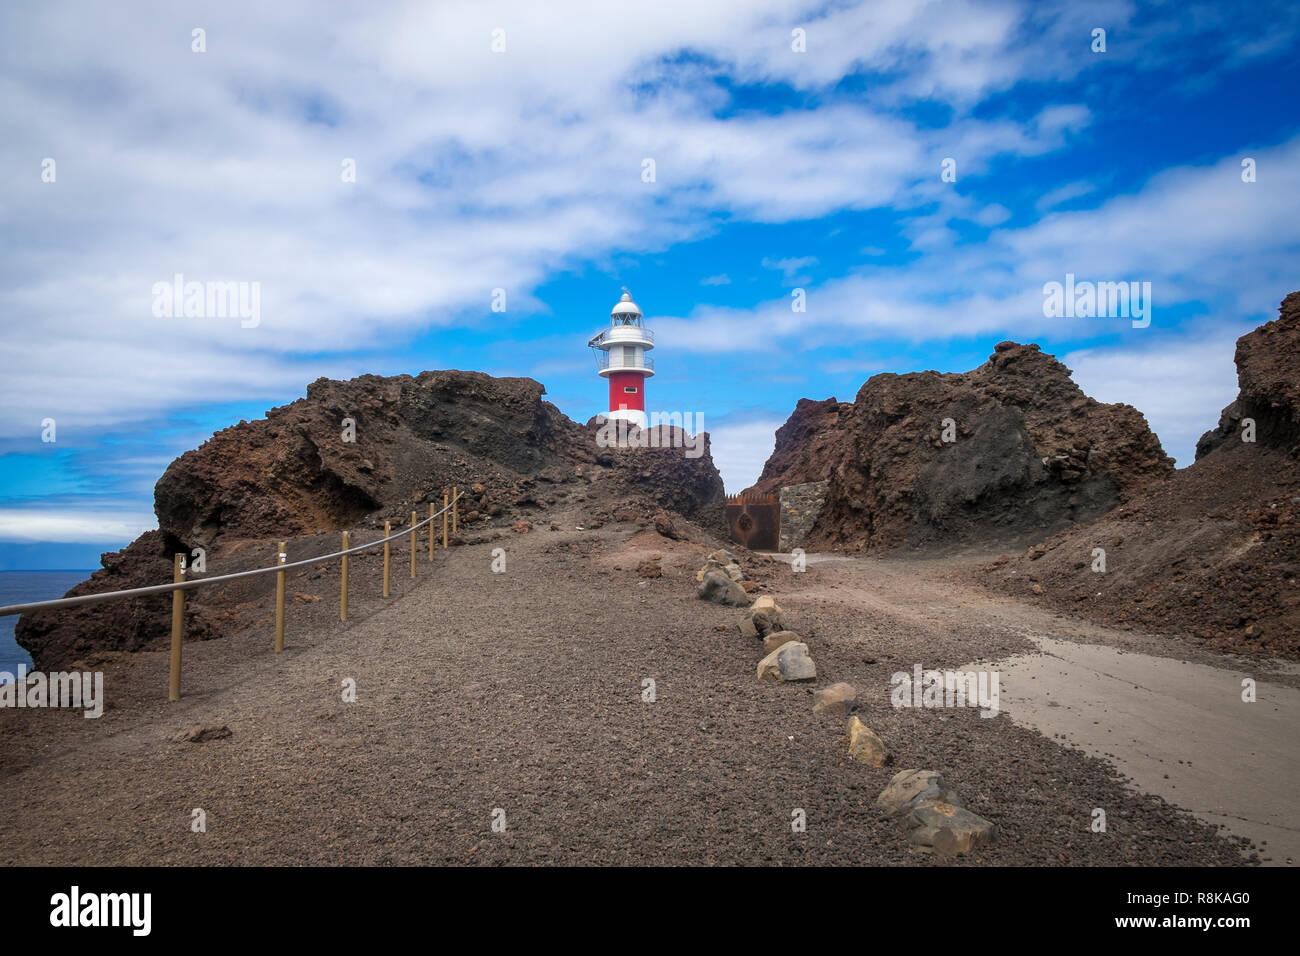 Leuchtturm am Teno, Nordseite von Teneriffa - Stock Image